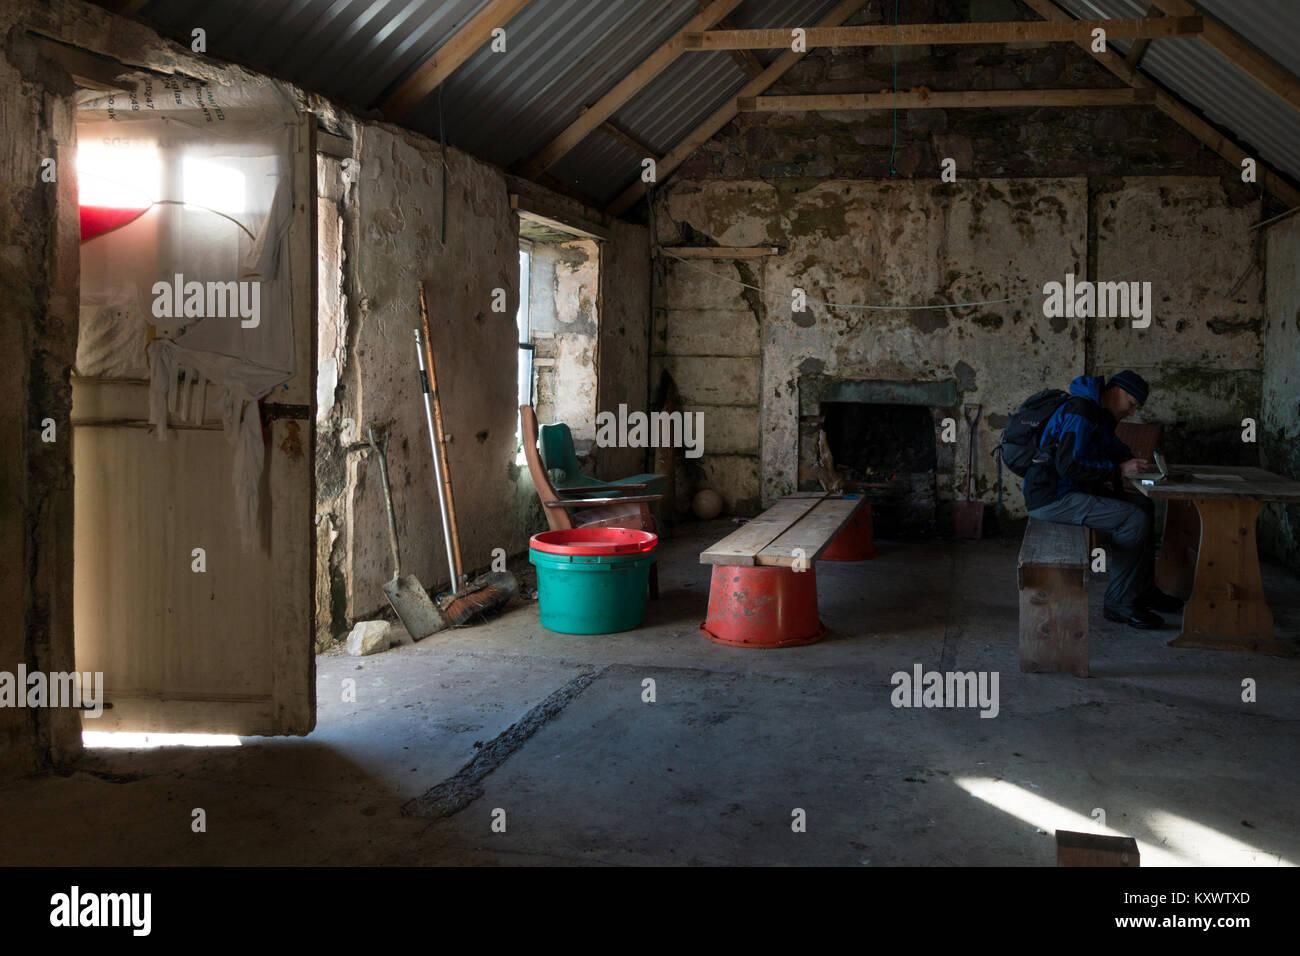 Inside Proaig Bothy with a walker sitting down, near Ardtalla, Isle of Islay, Scotland - Stock Image